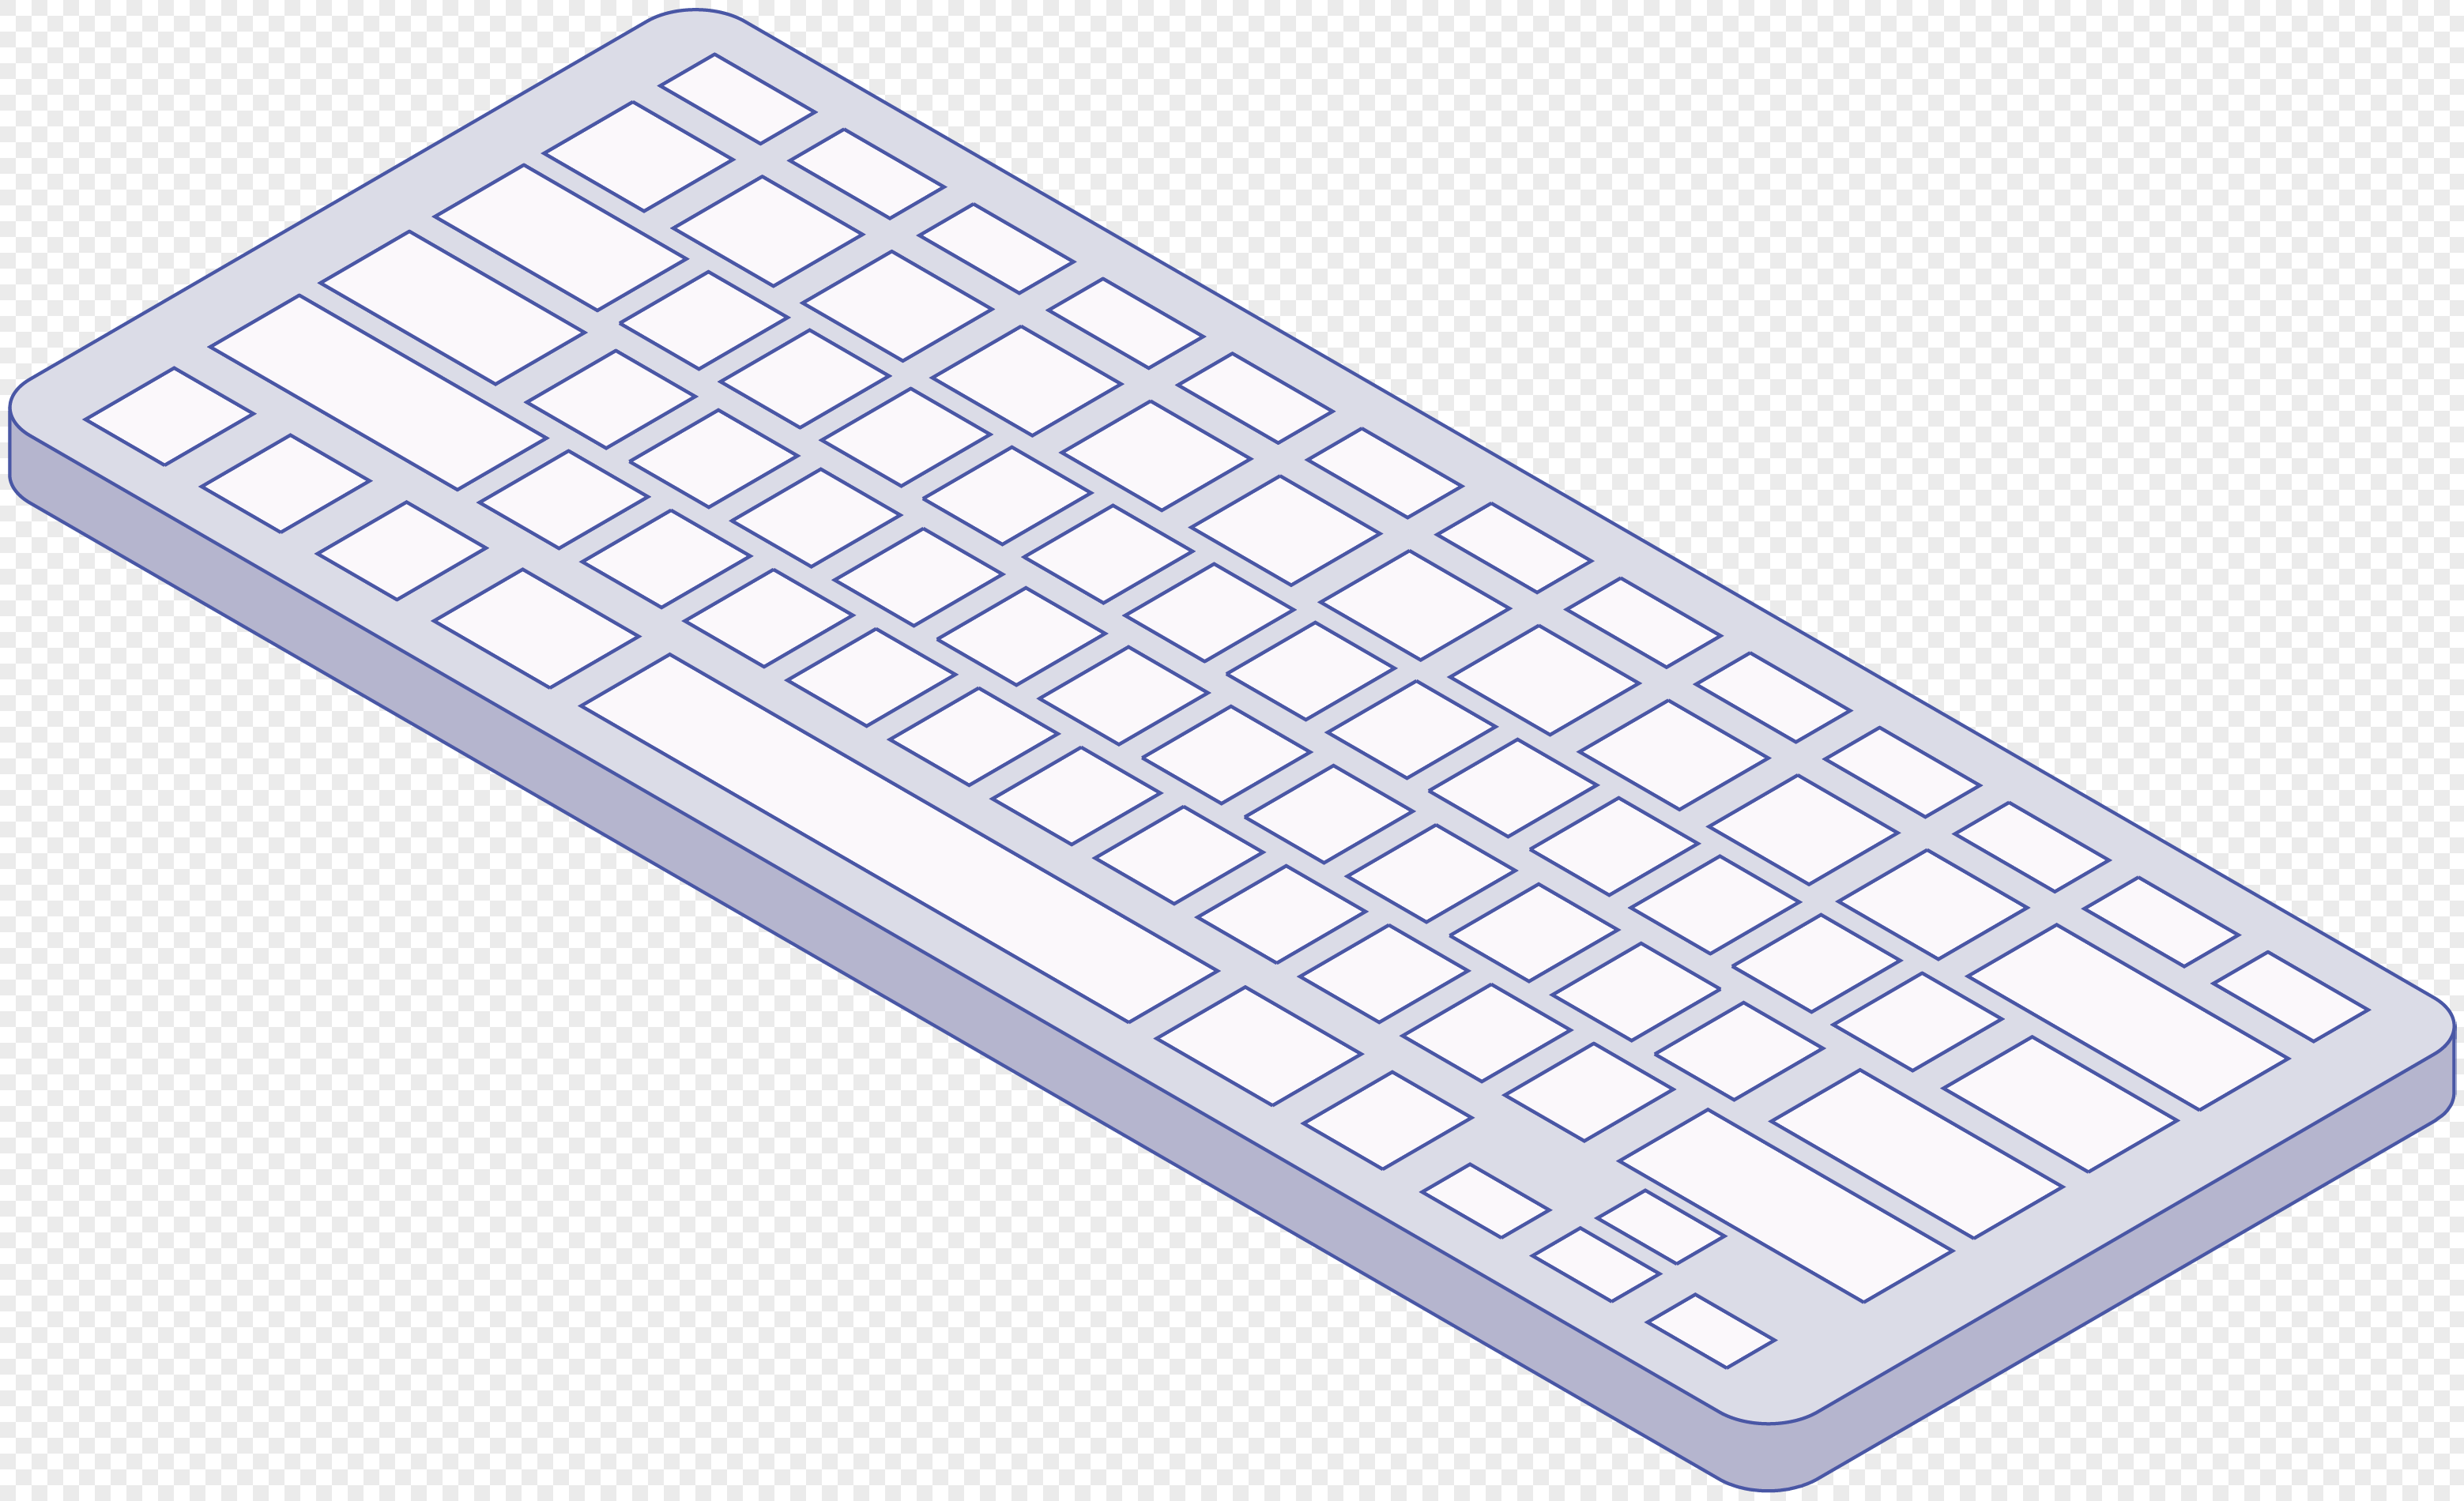 learning office stationery wireless keyboard cartoon vector mate